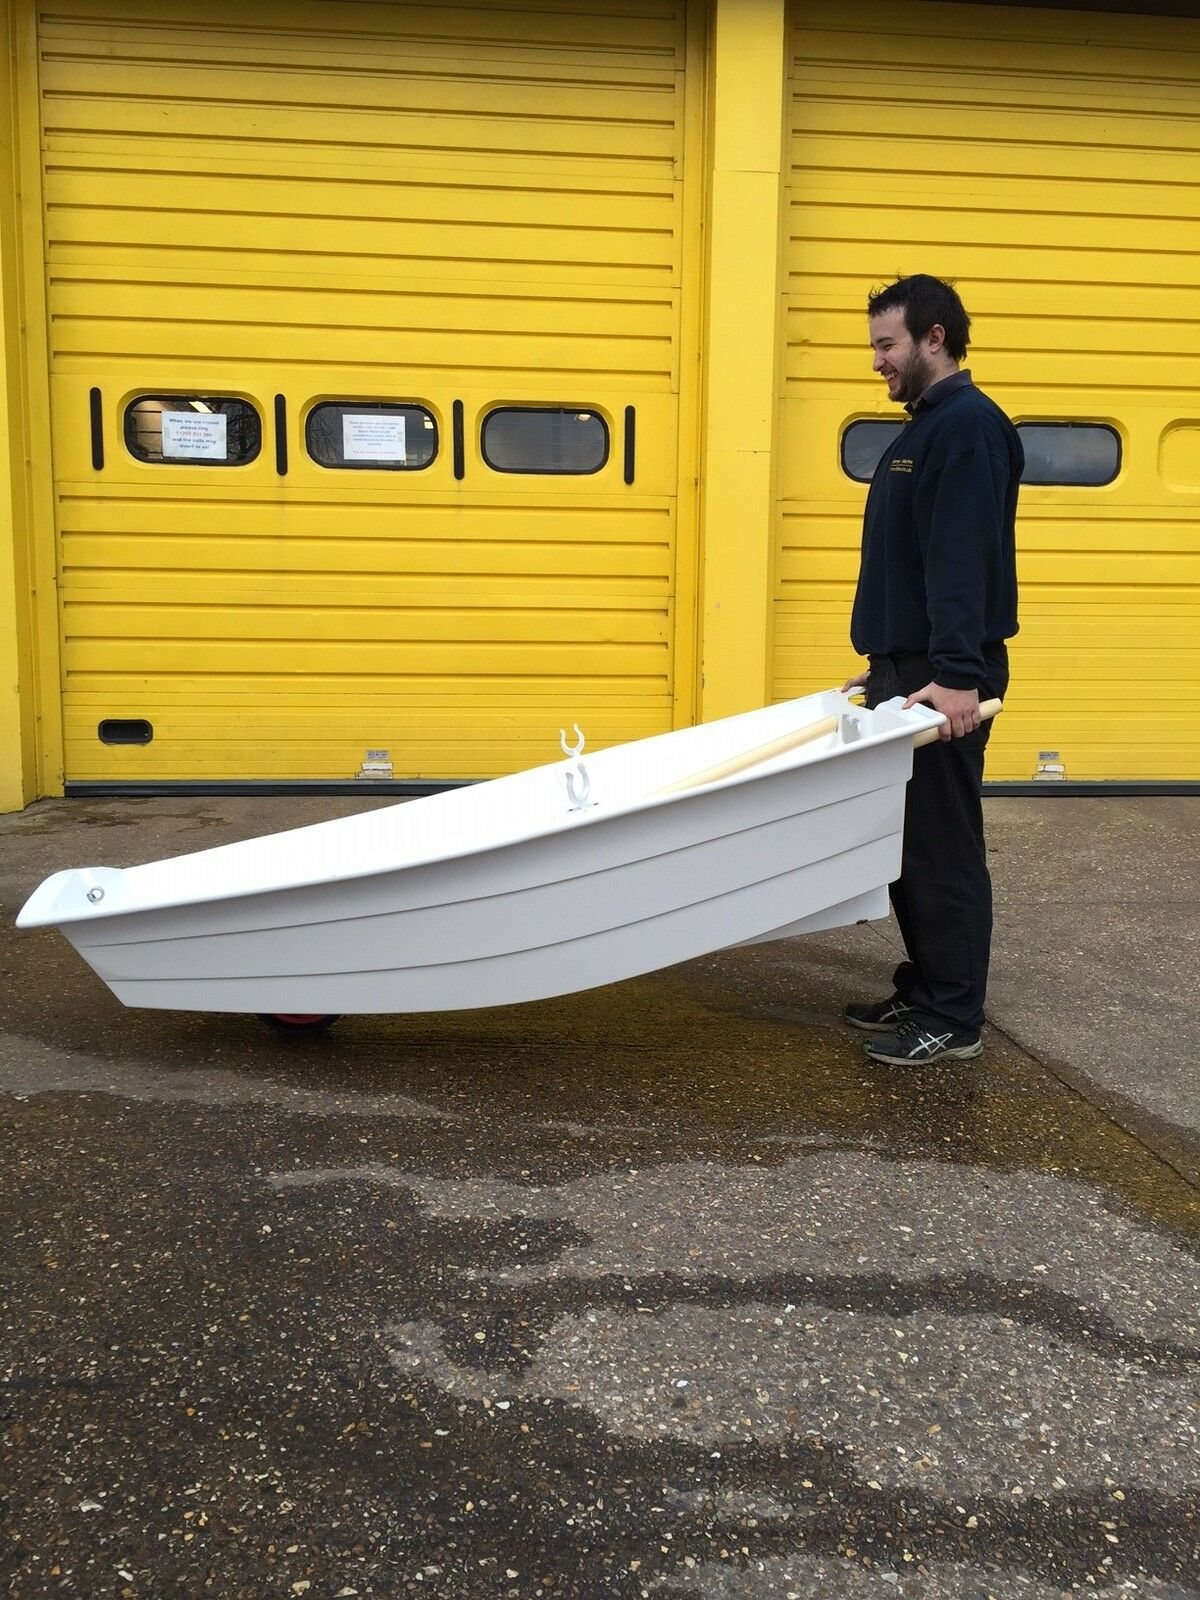 Fibreglass Pram ROLLER Dinghy Rowing Boat 2 m 6' 8  Row Tender Inc Launch Wheel